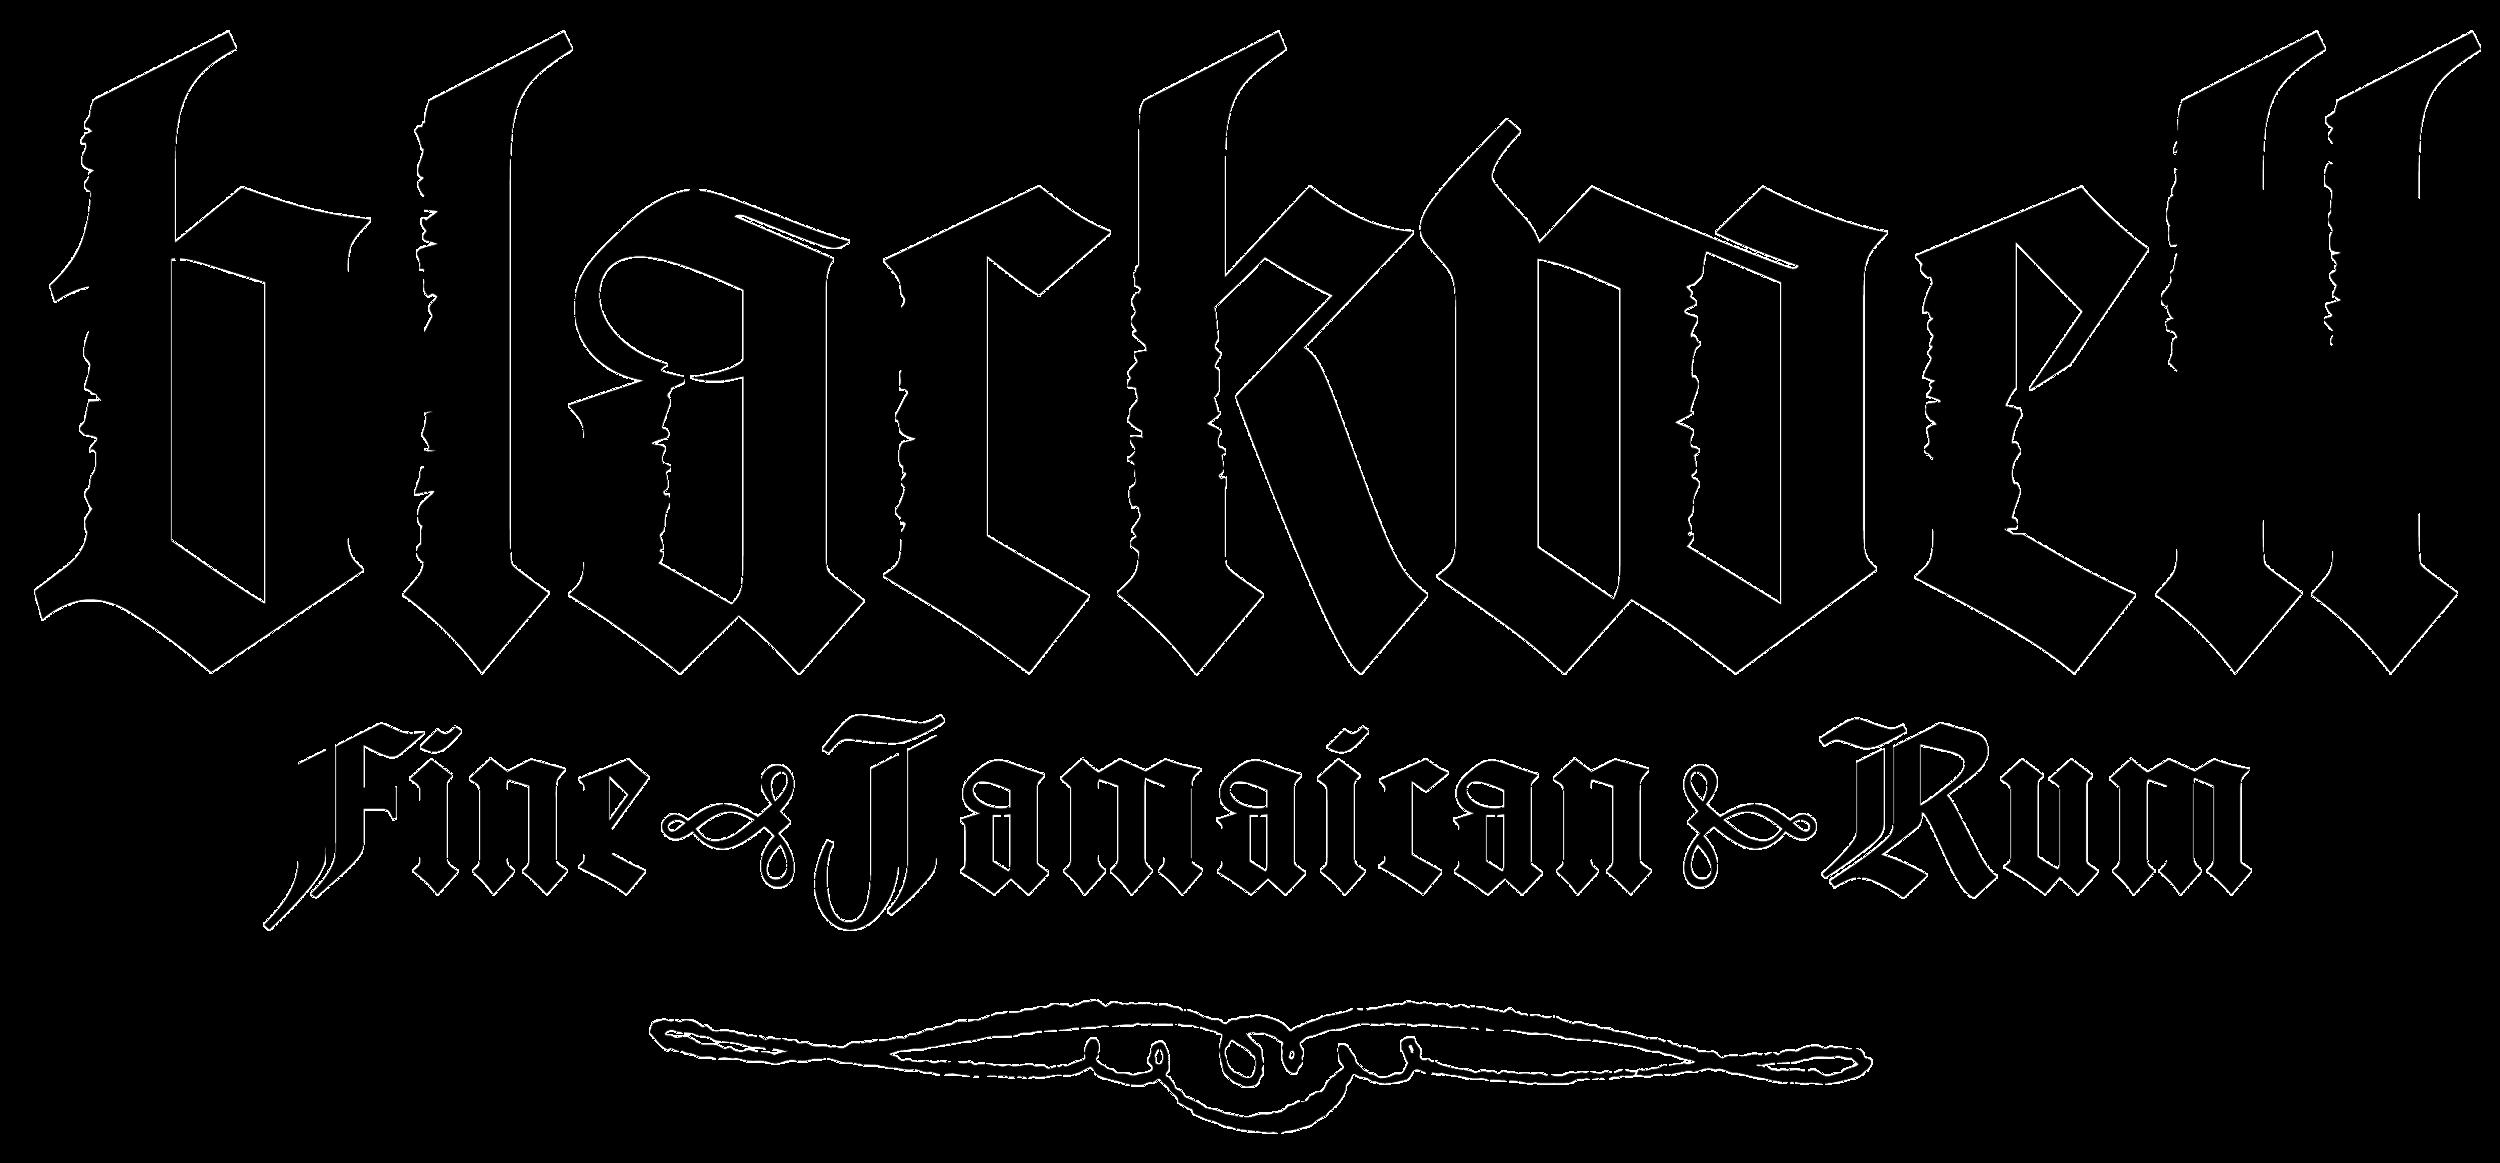 blackwell_logo_1.png